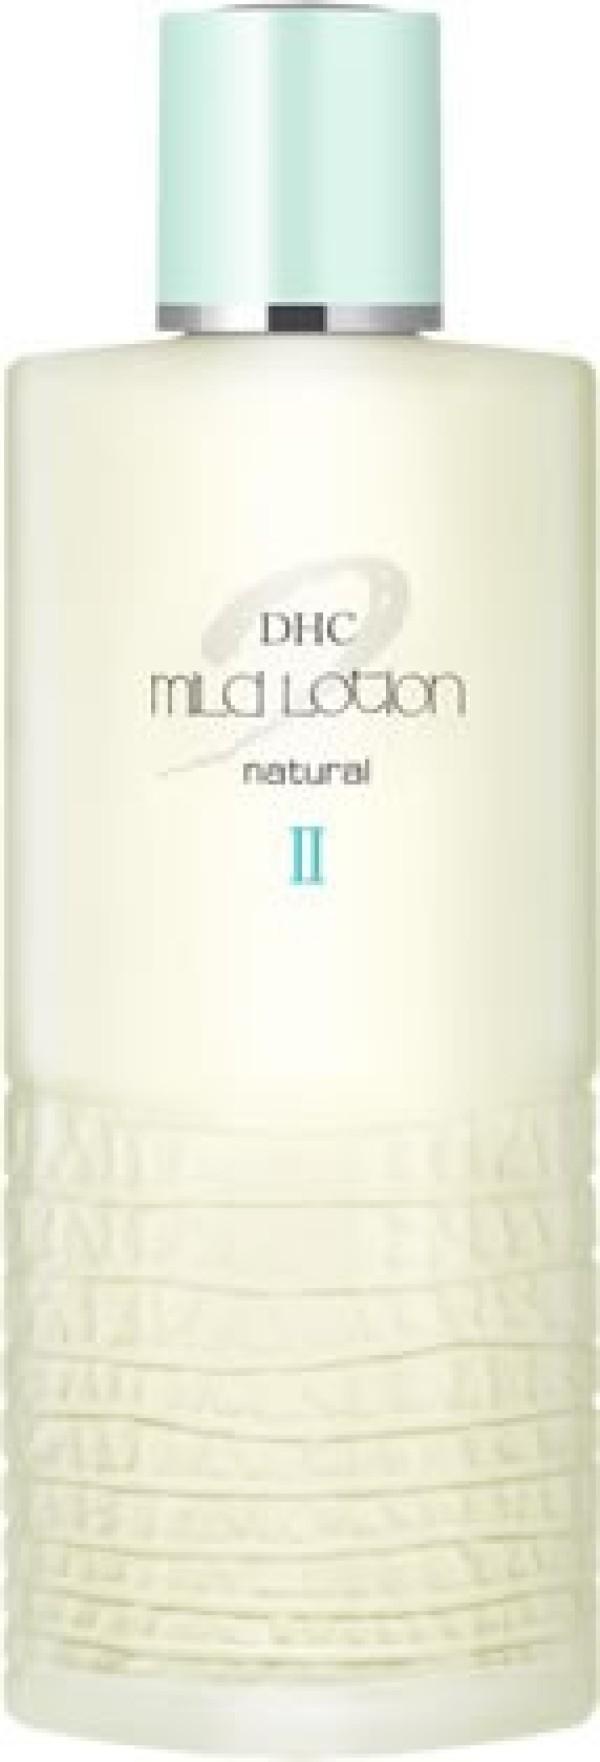 DHC Medicinal Mild Lotion II